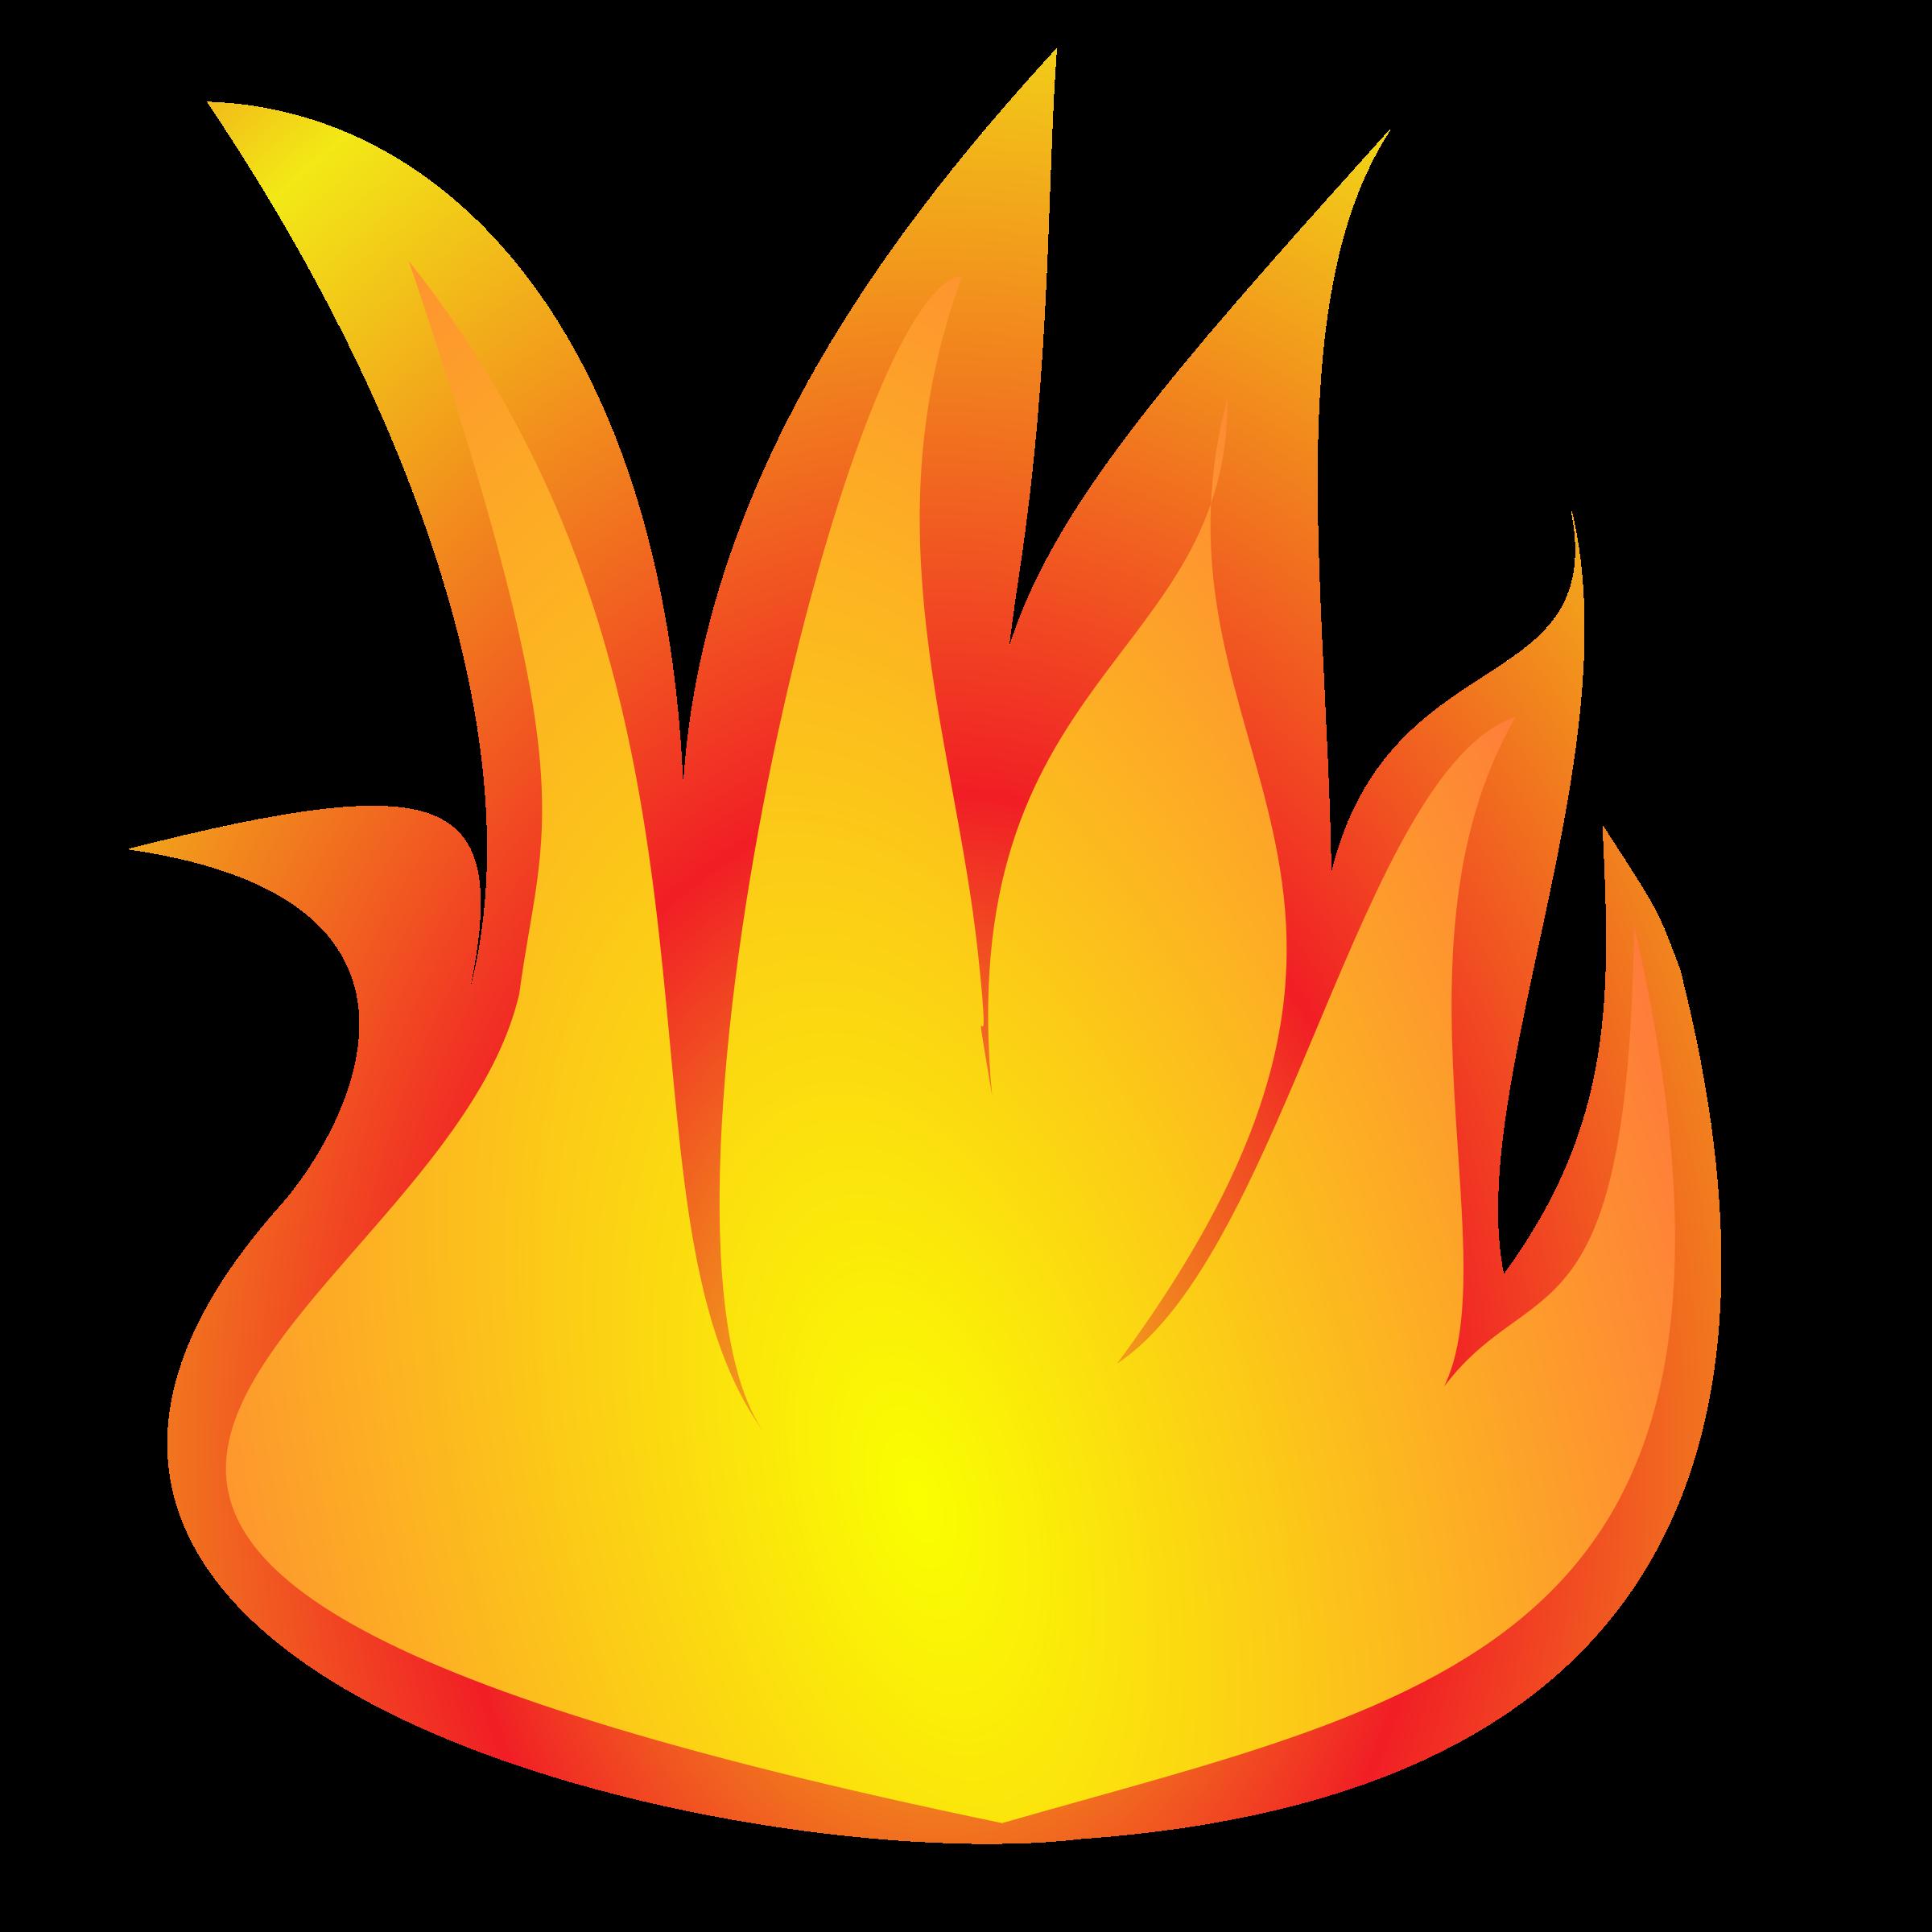 2400x2400 Clip Art Flame Amp Look At Clip Art Flame Clip Art Images